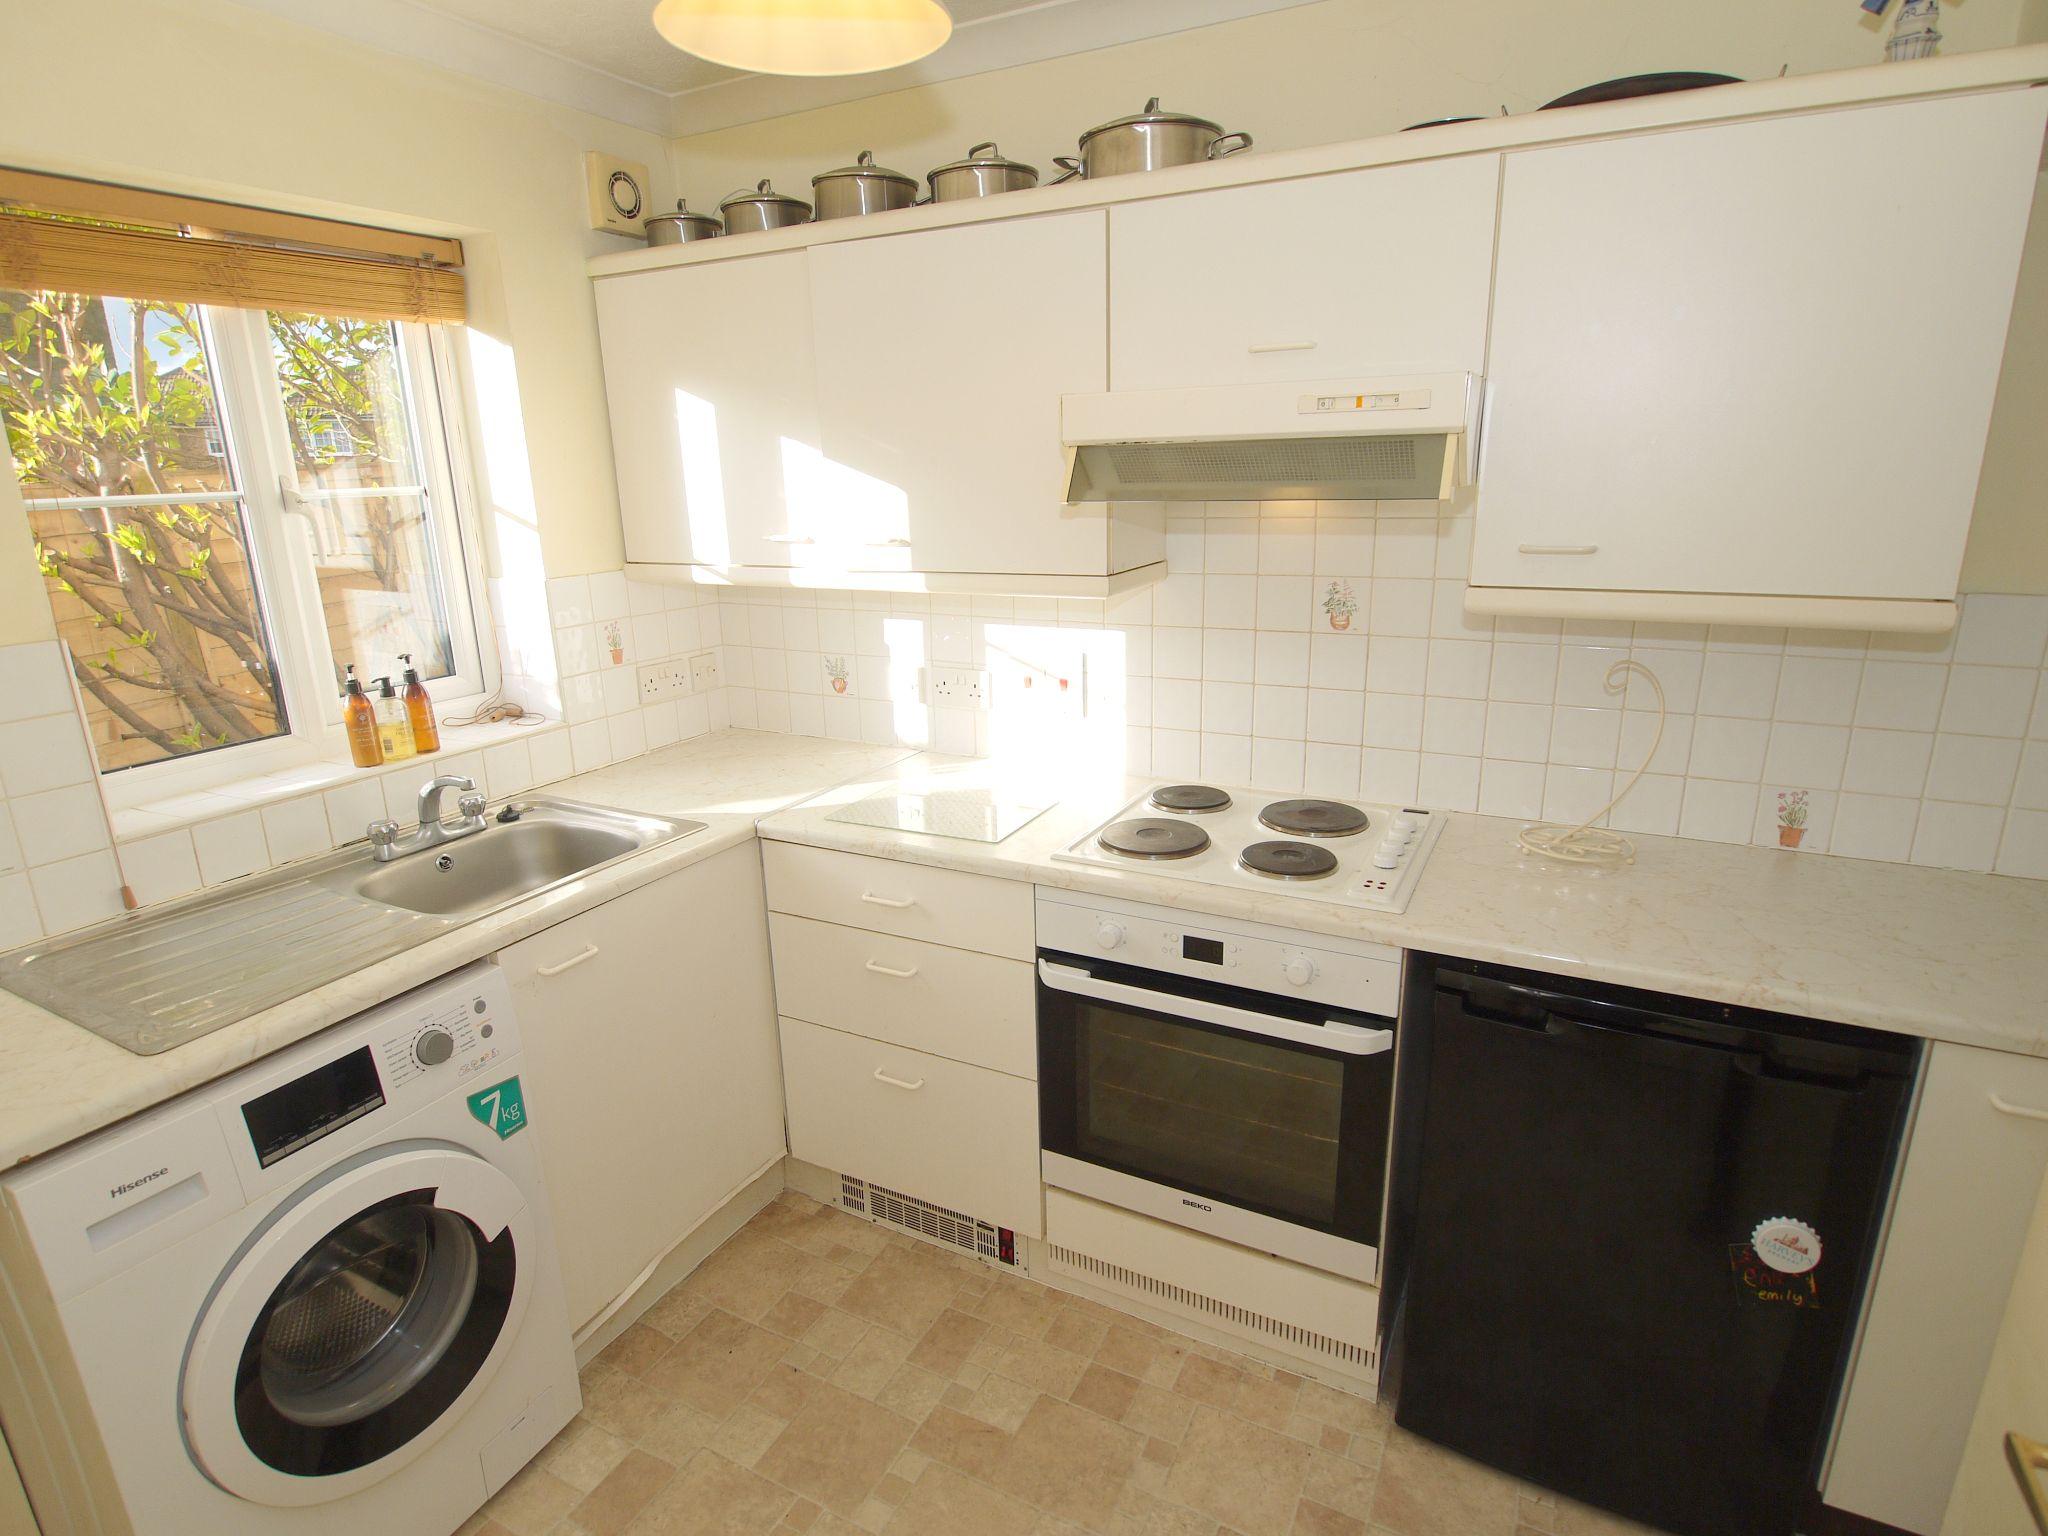 1 bedroom flat Sold in Sevenoaks - Photograph 3